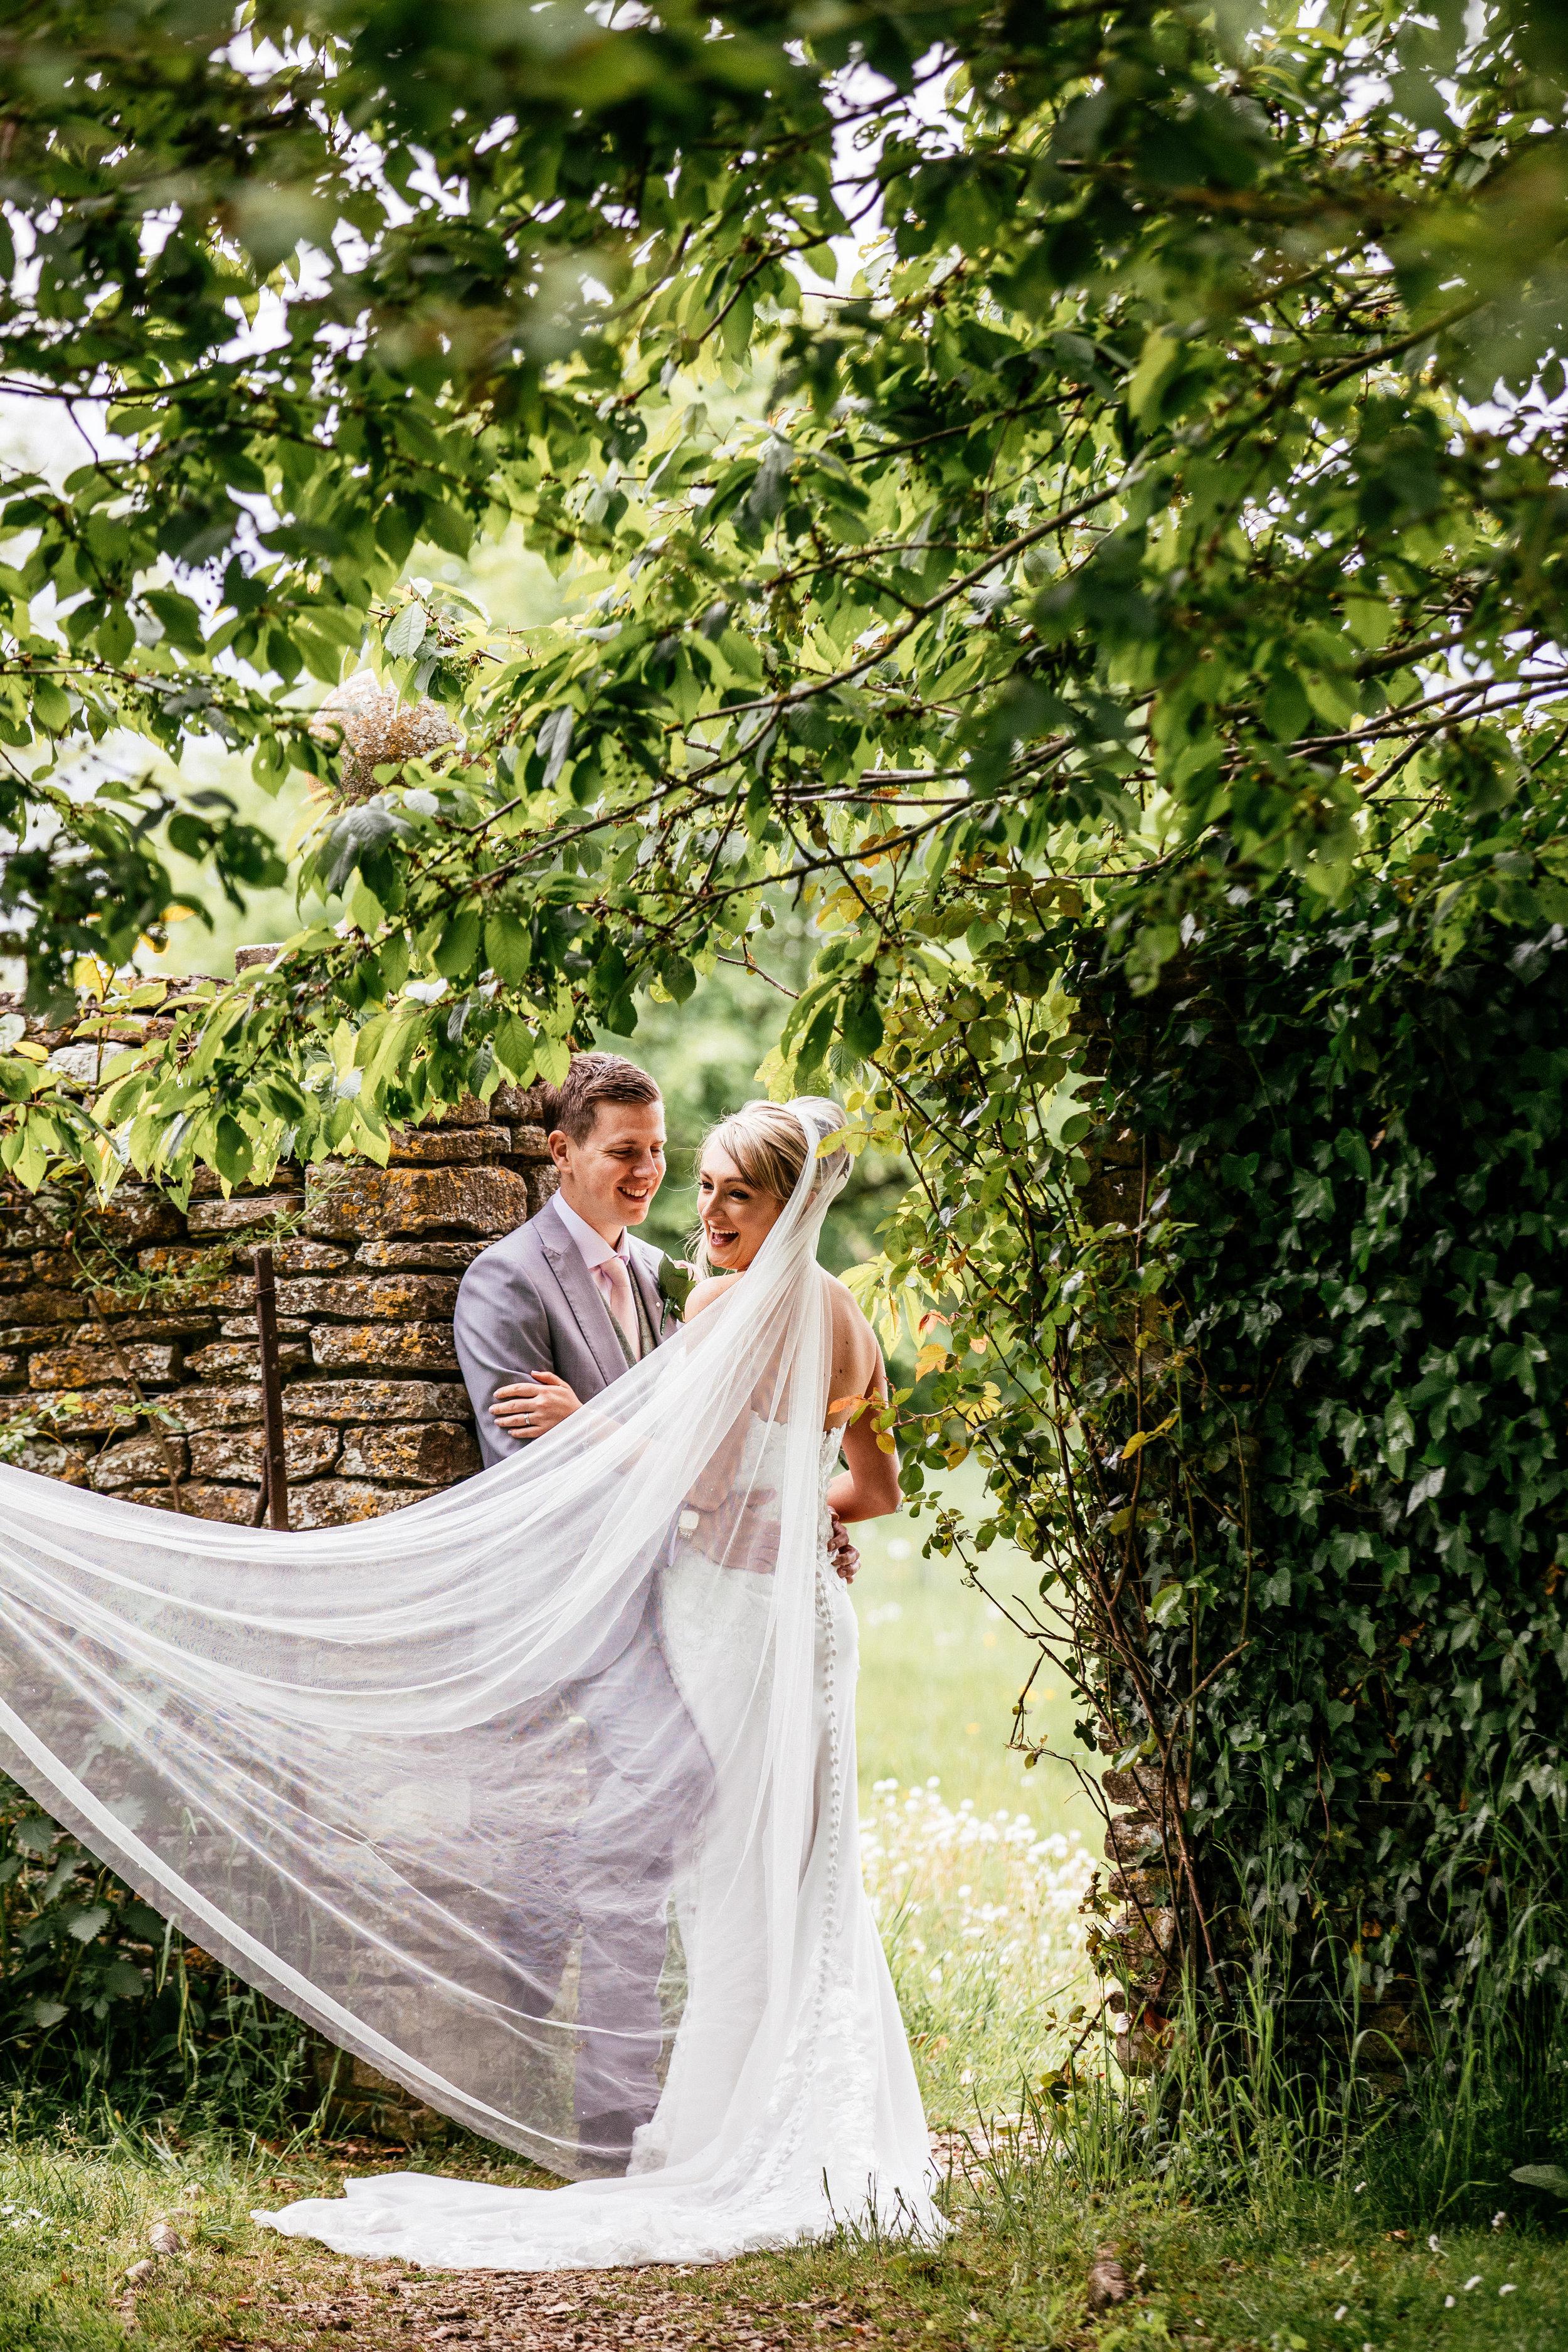 Becky-and-Sam-Wedding-Highlights-52.jpg